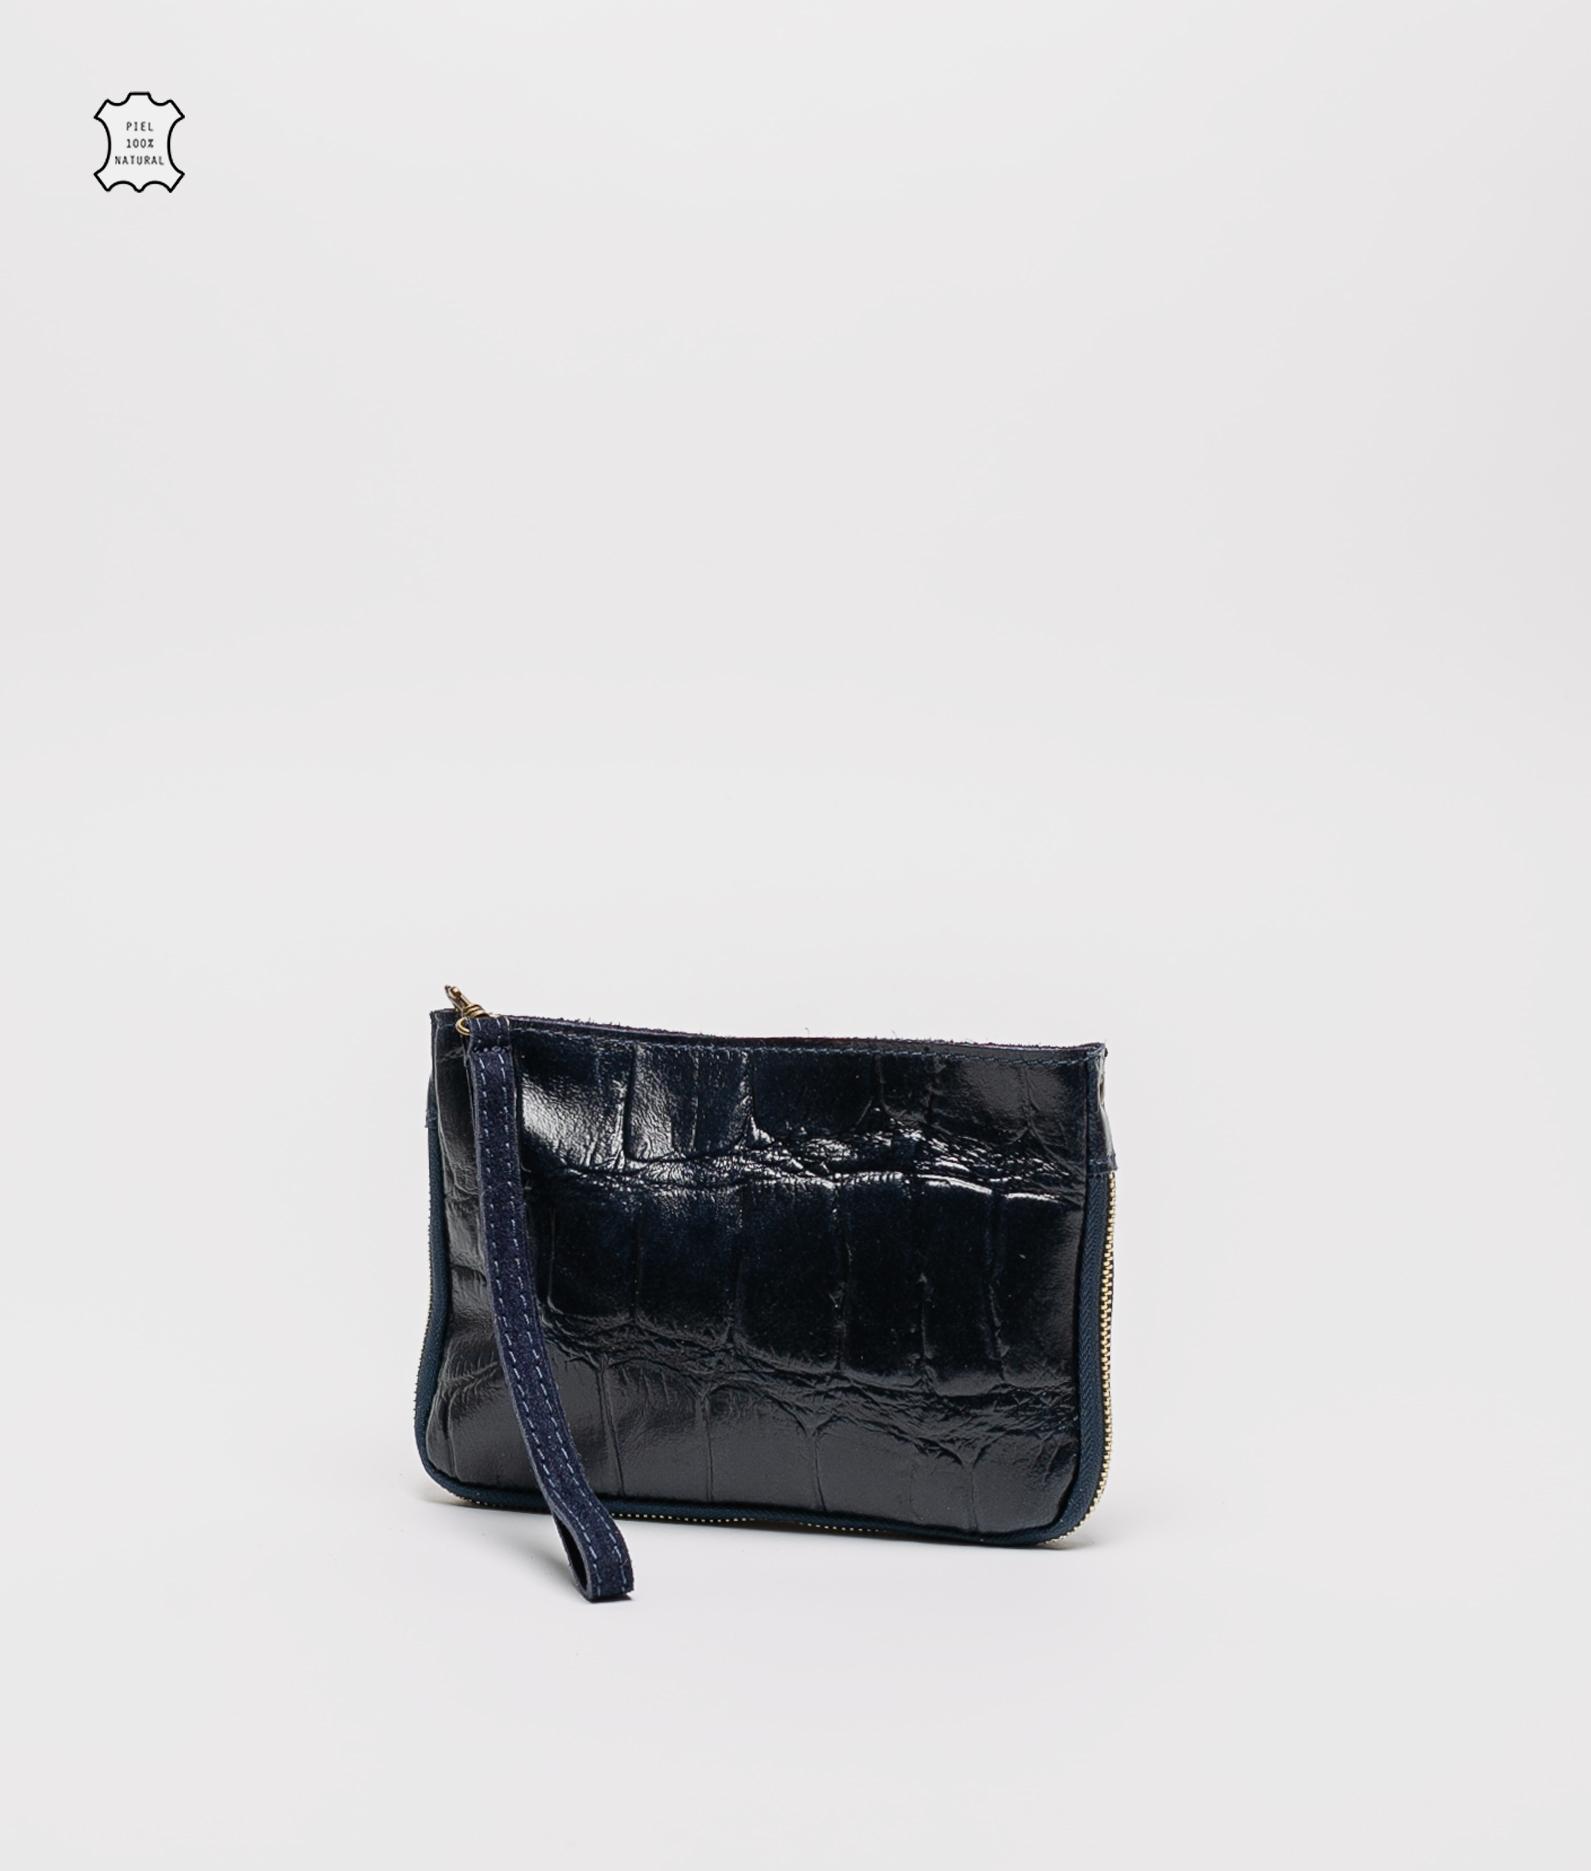 Finland leather crossbody bag - navy blue